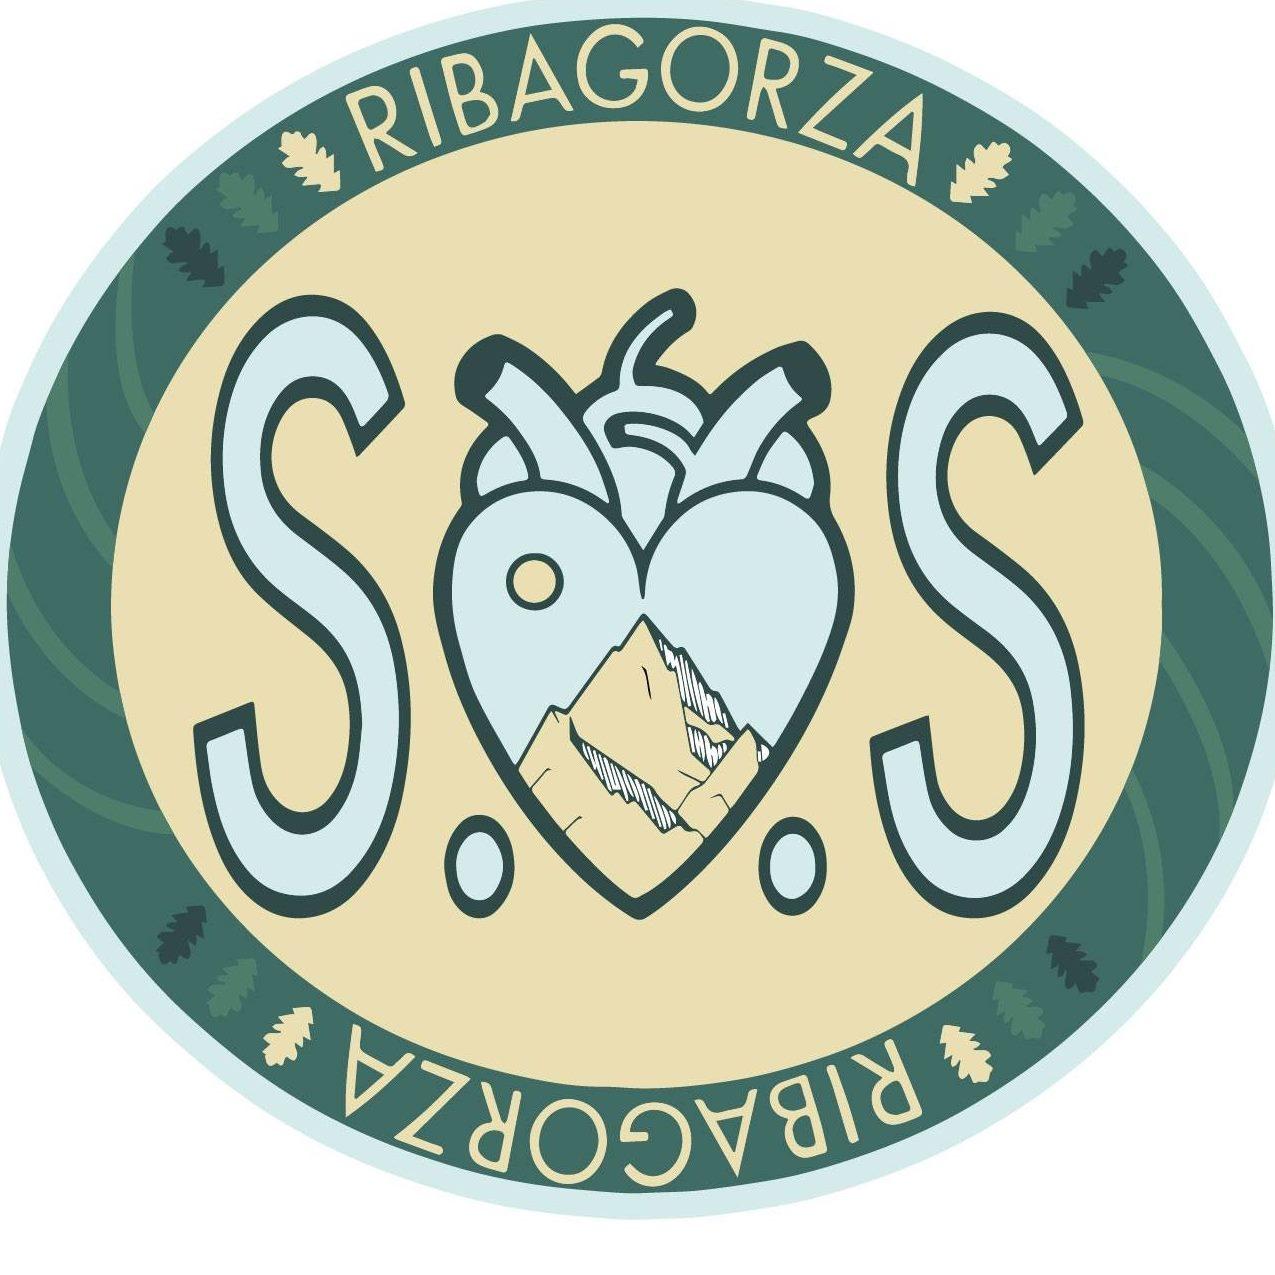 SOS Ribagorza